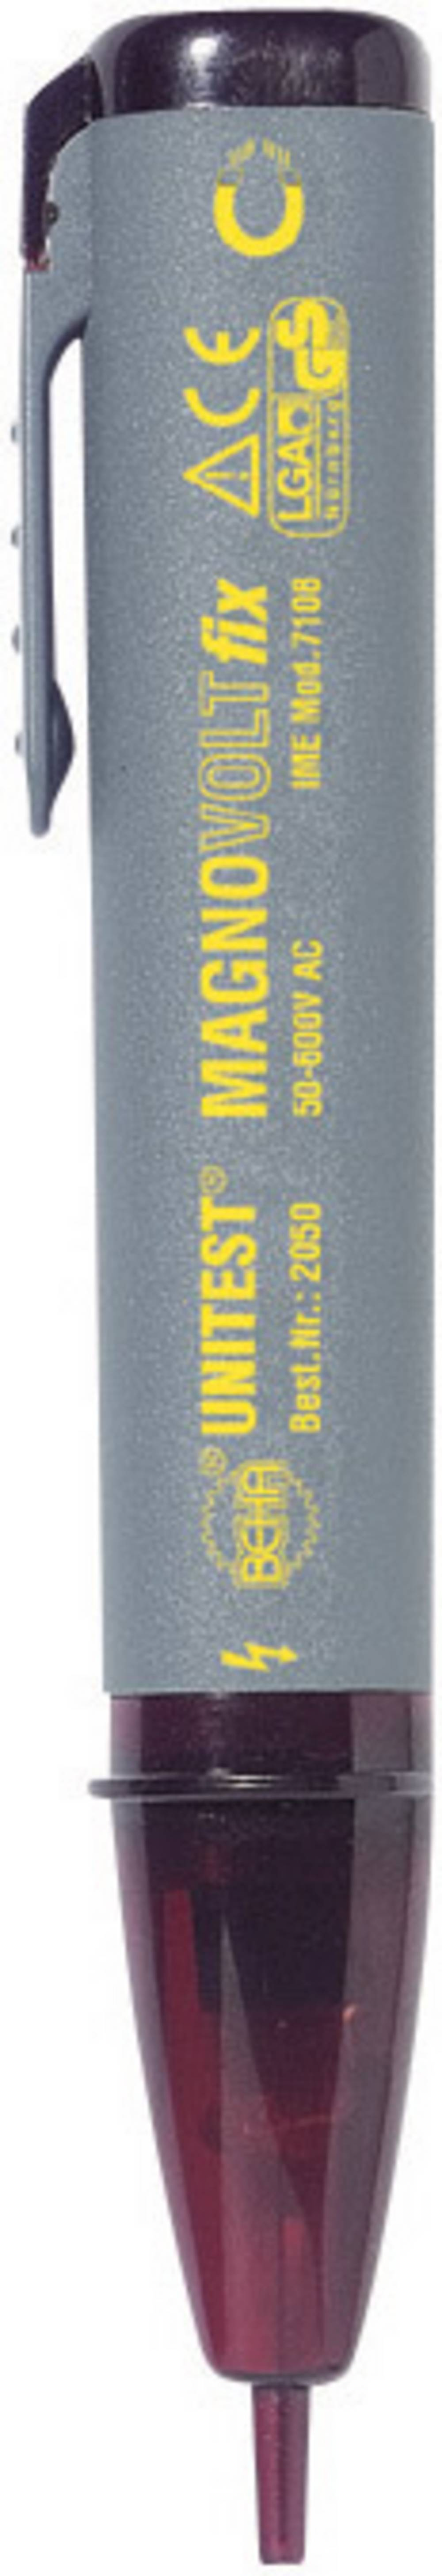 Beha Amprobe UNITEST MAGNO-VOLTFIX multi-tester CAT III 600 V